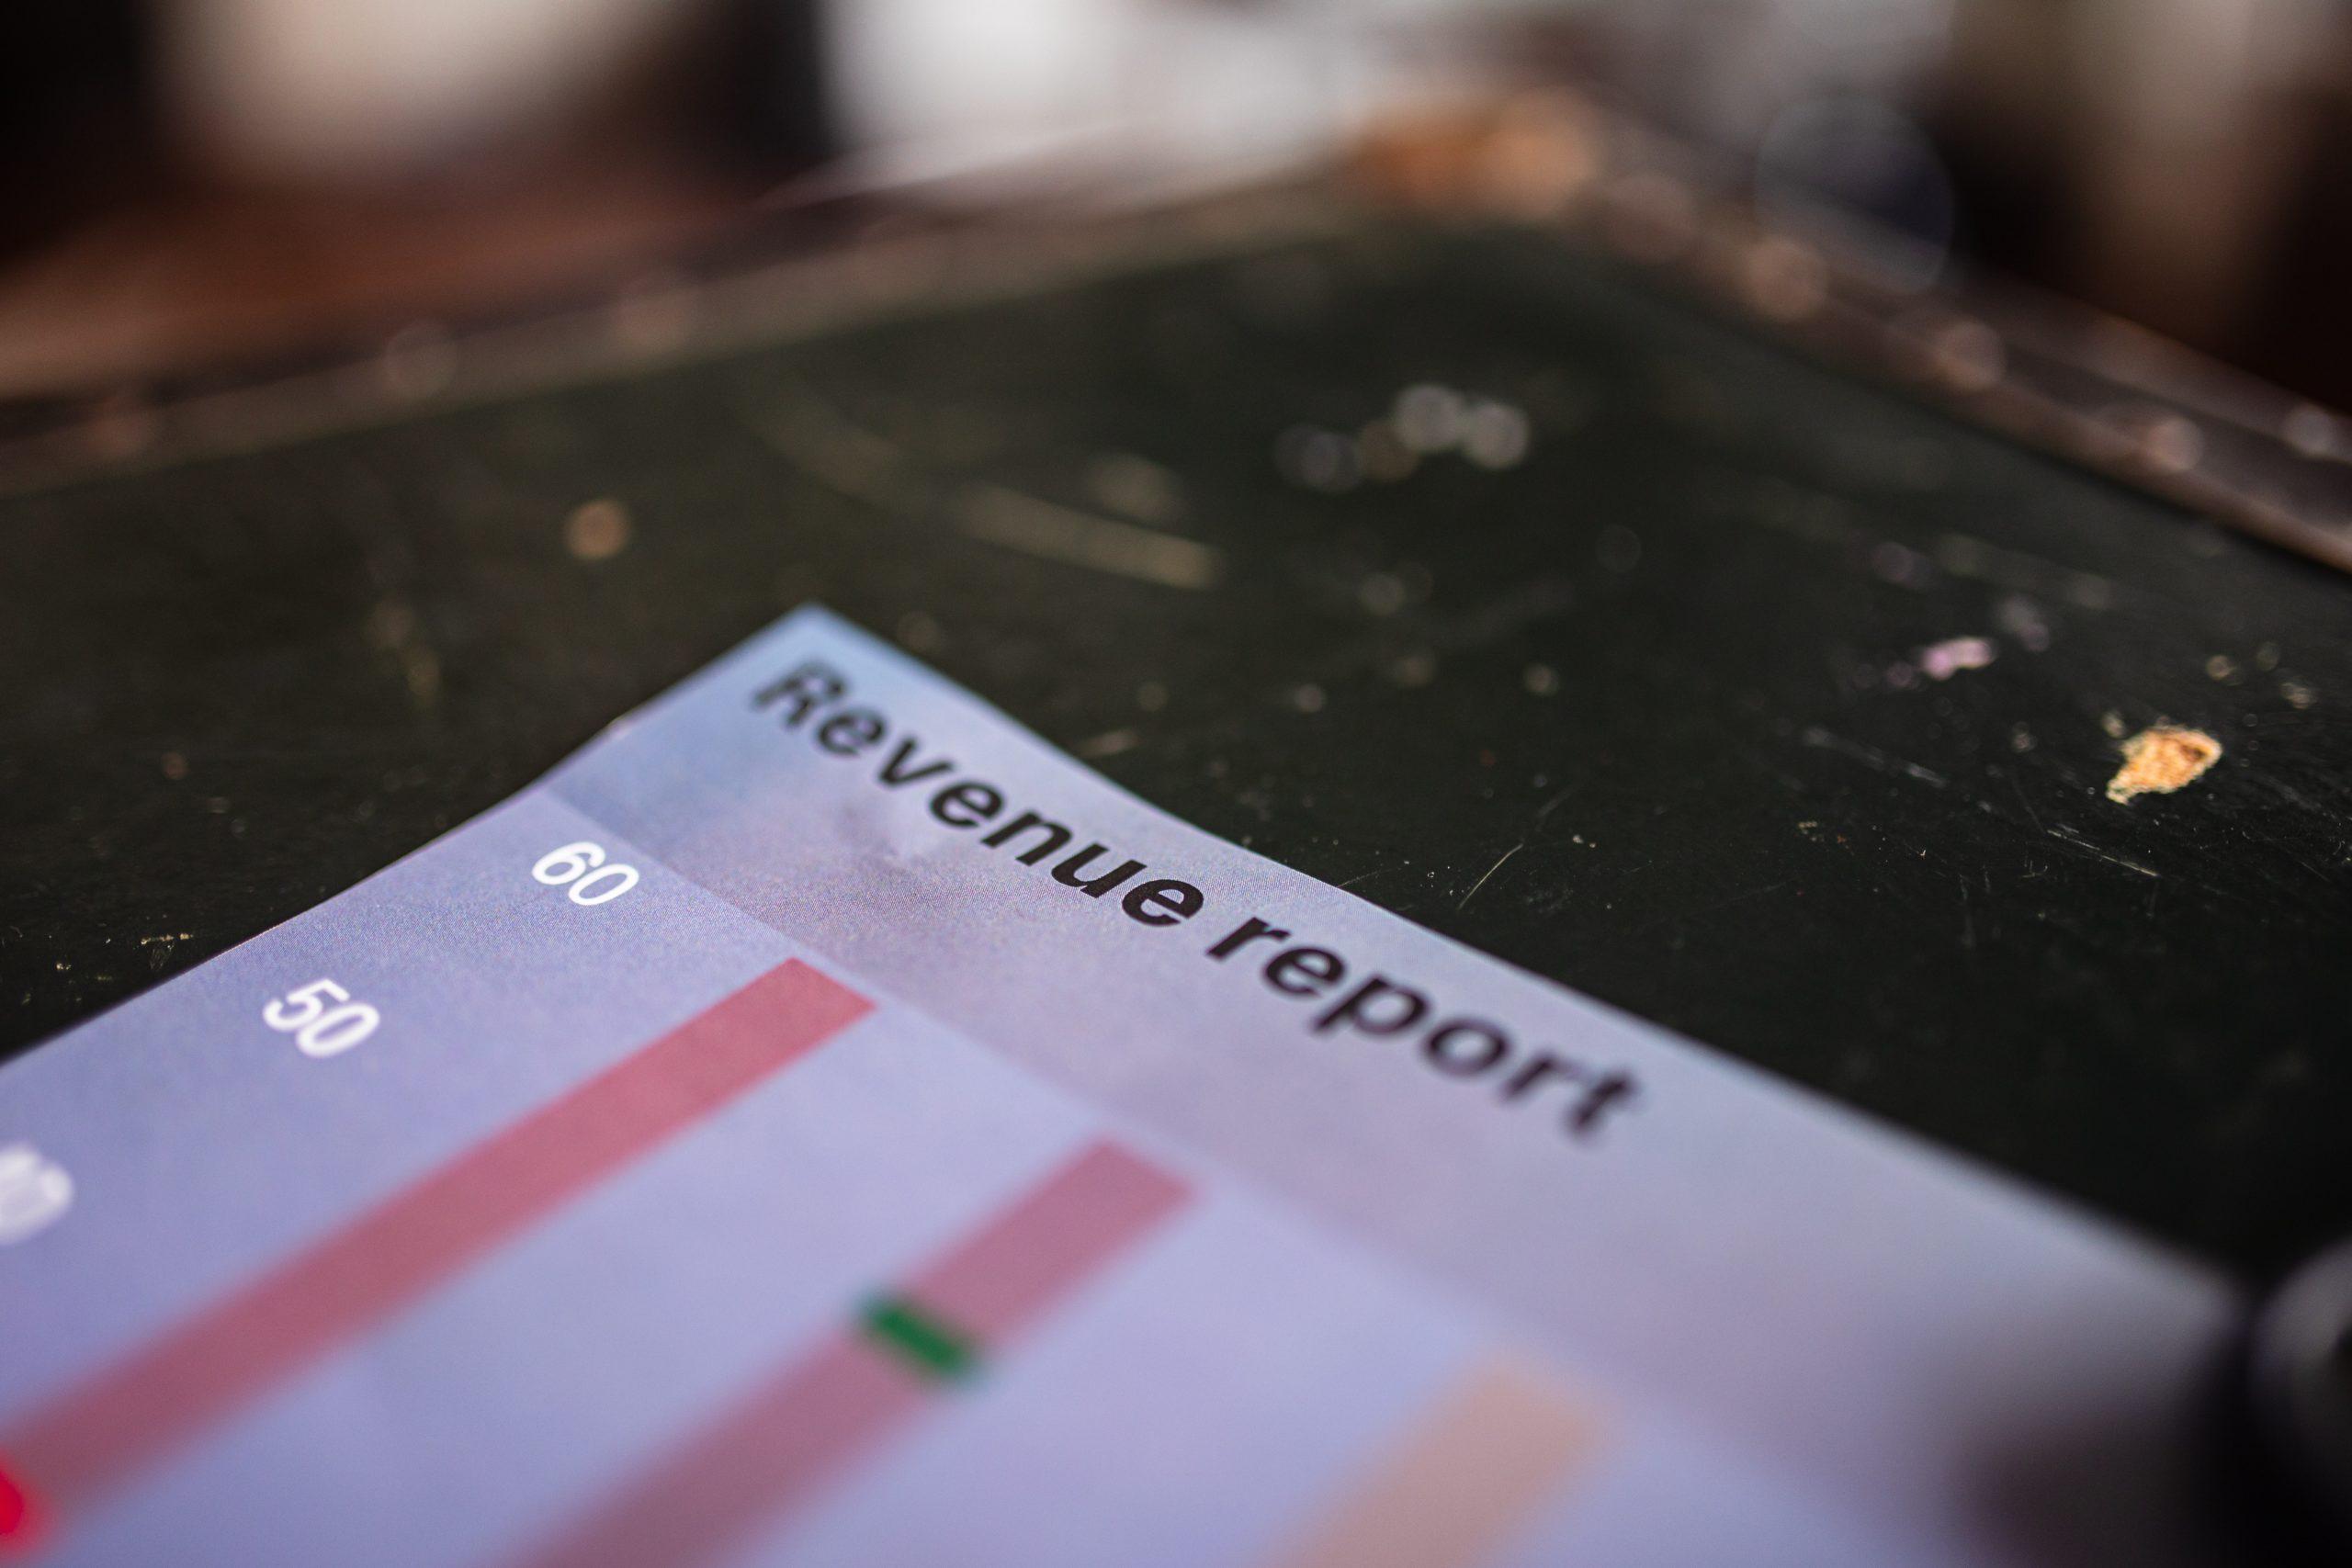 wykres - raport